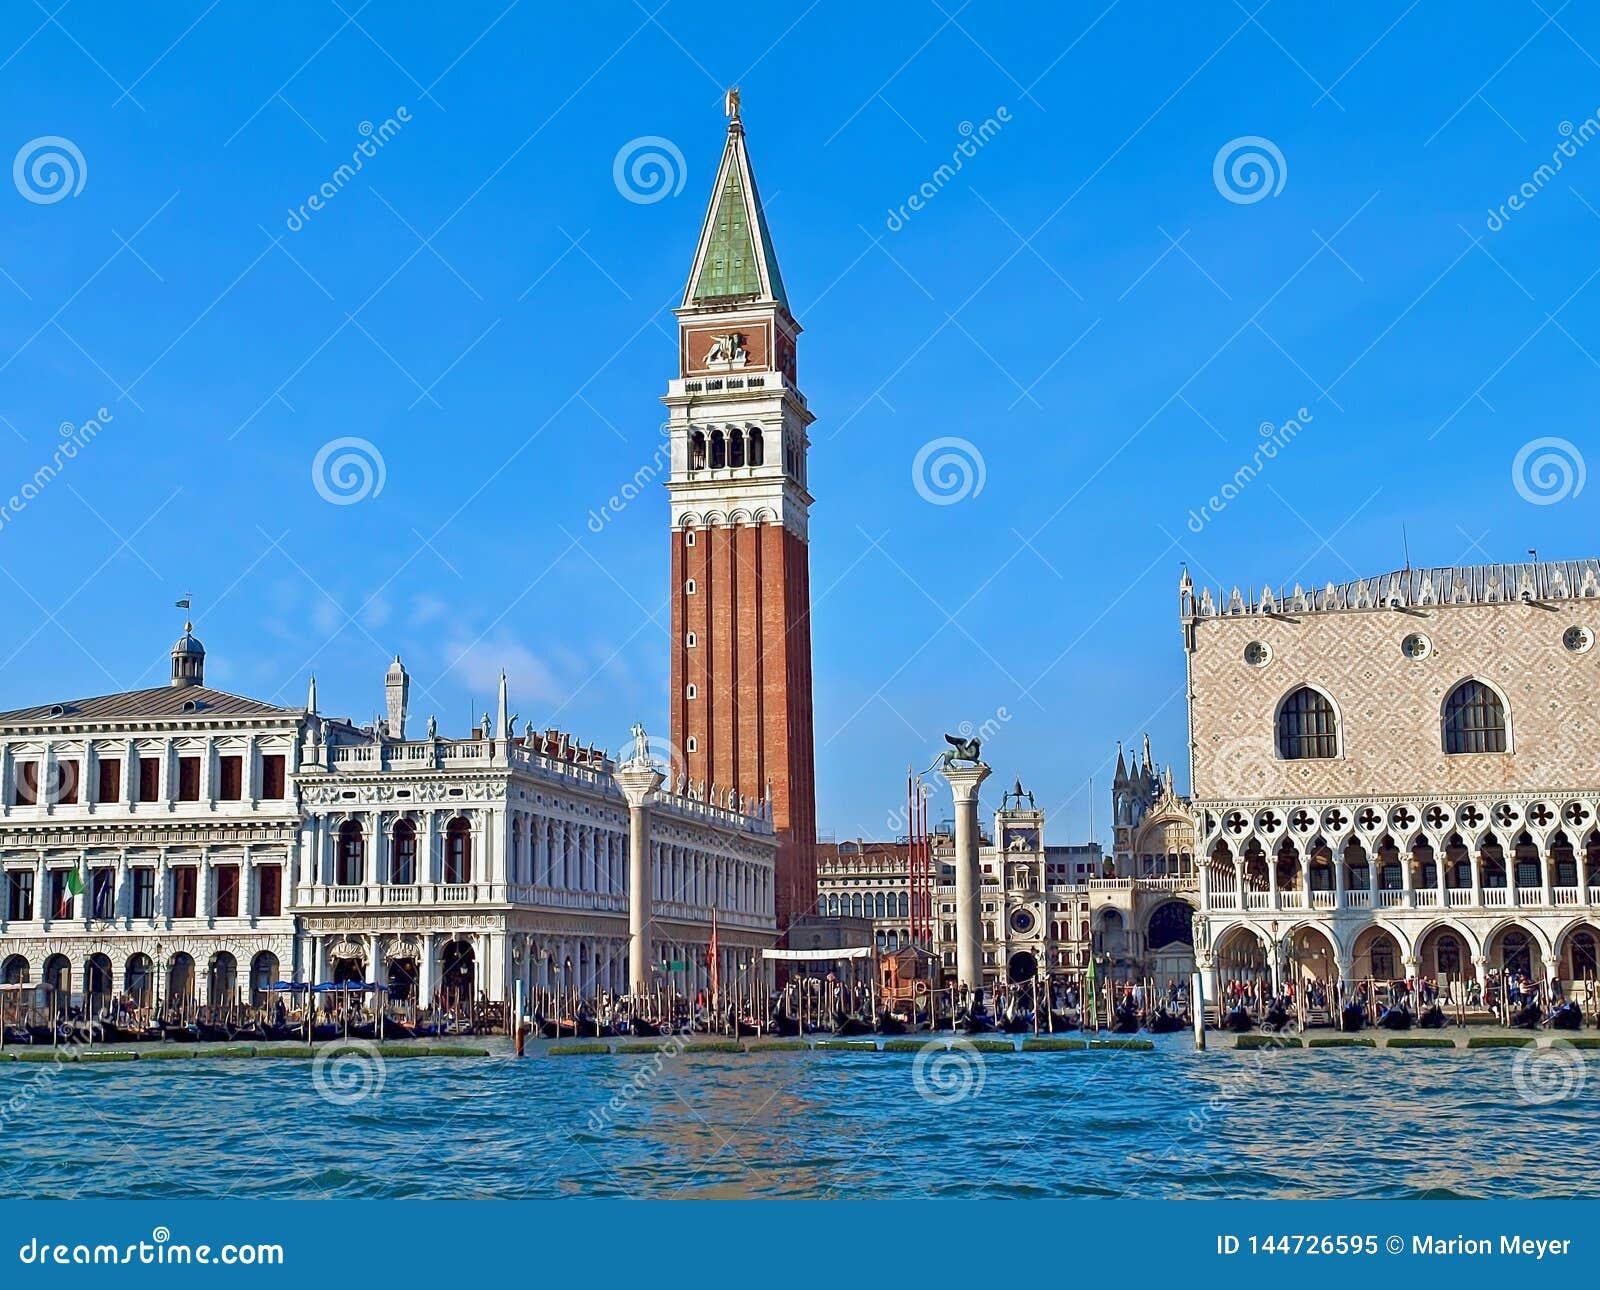 Колокольня и дворец дожа на St Mark в Венеции в Италии